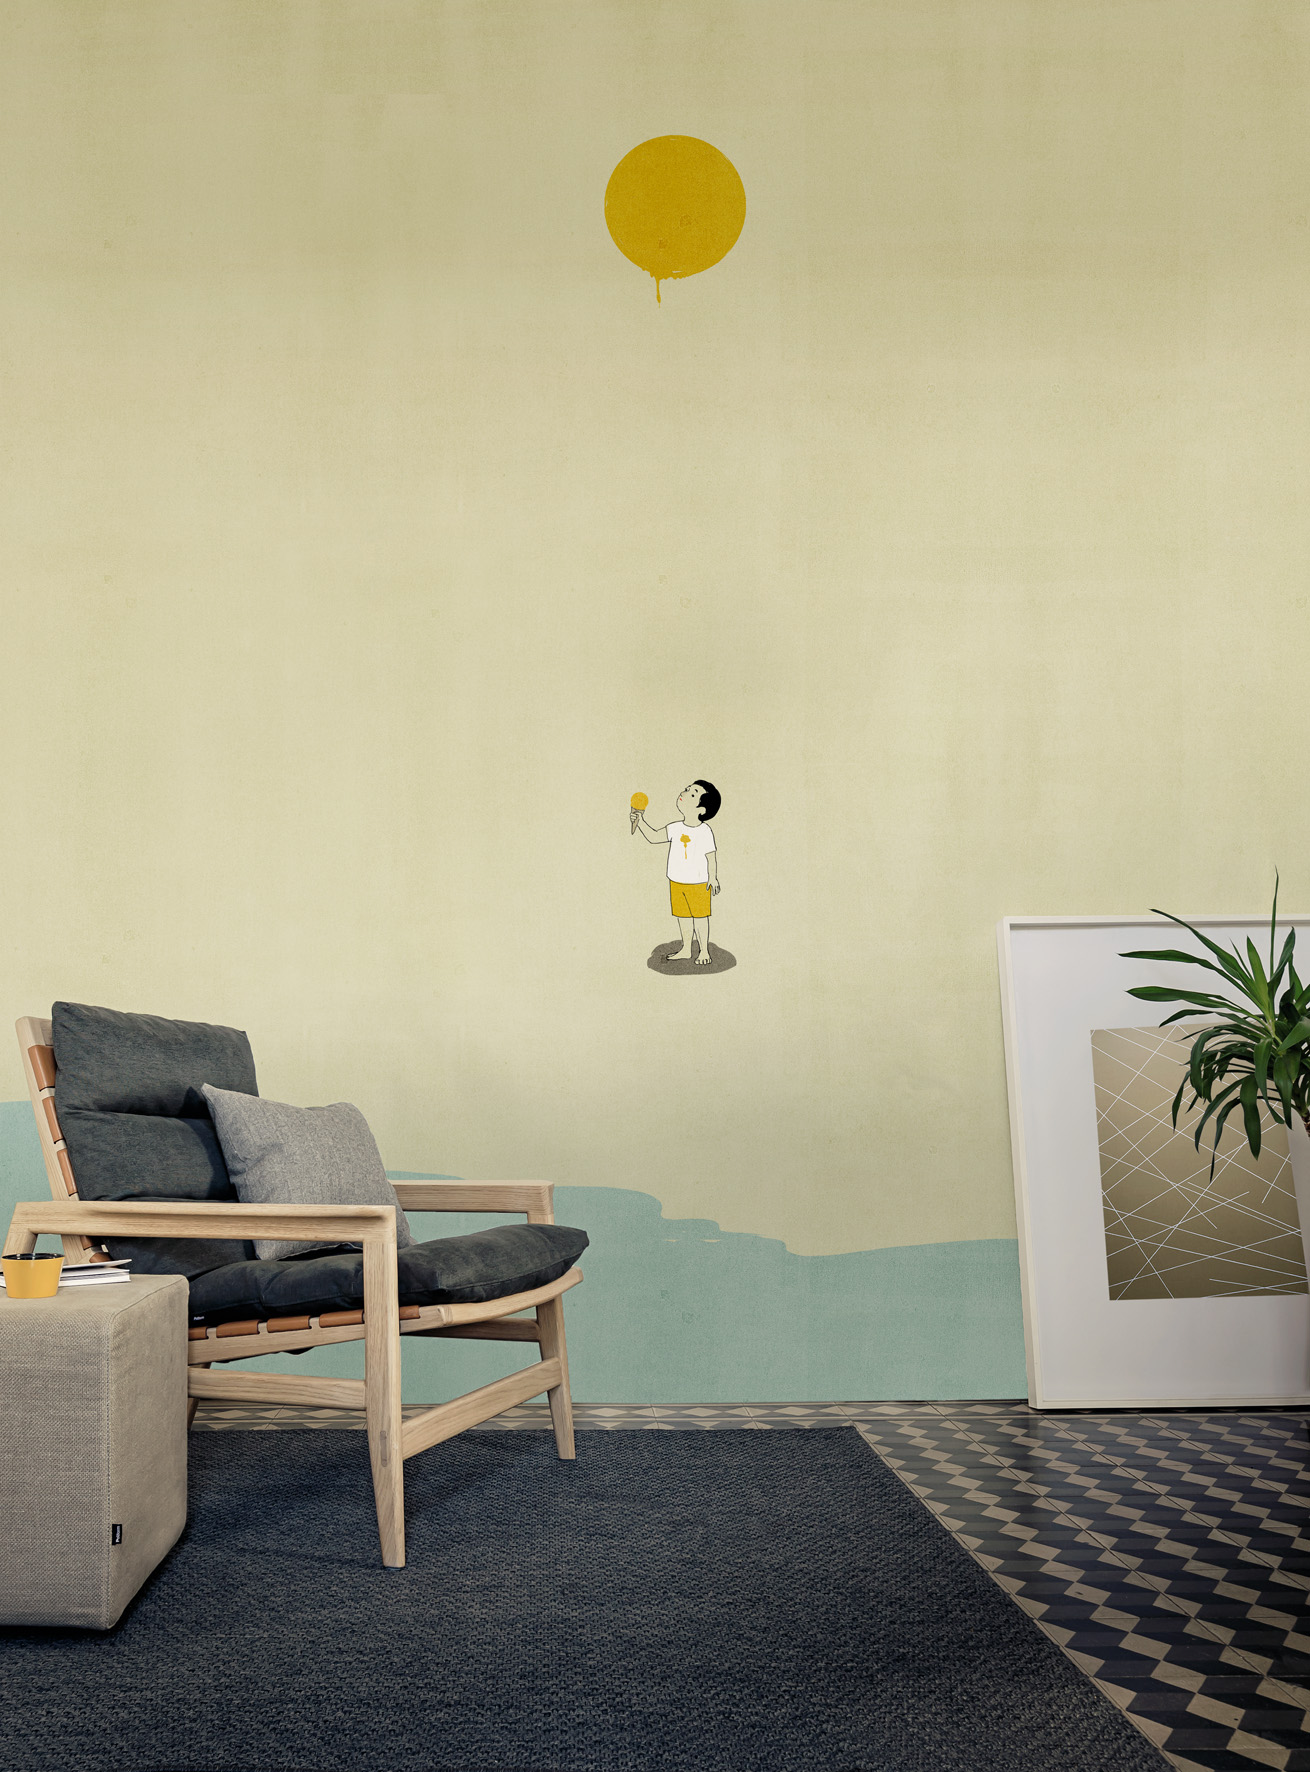 wallpaper yellow mellow by wall dec design alessandro gottardo shout. Black Bedroom Furniture Sets. Home Design Ideas